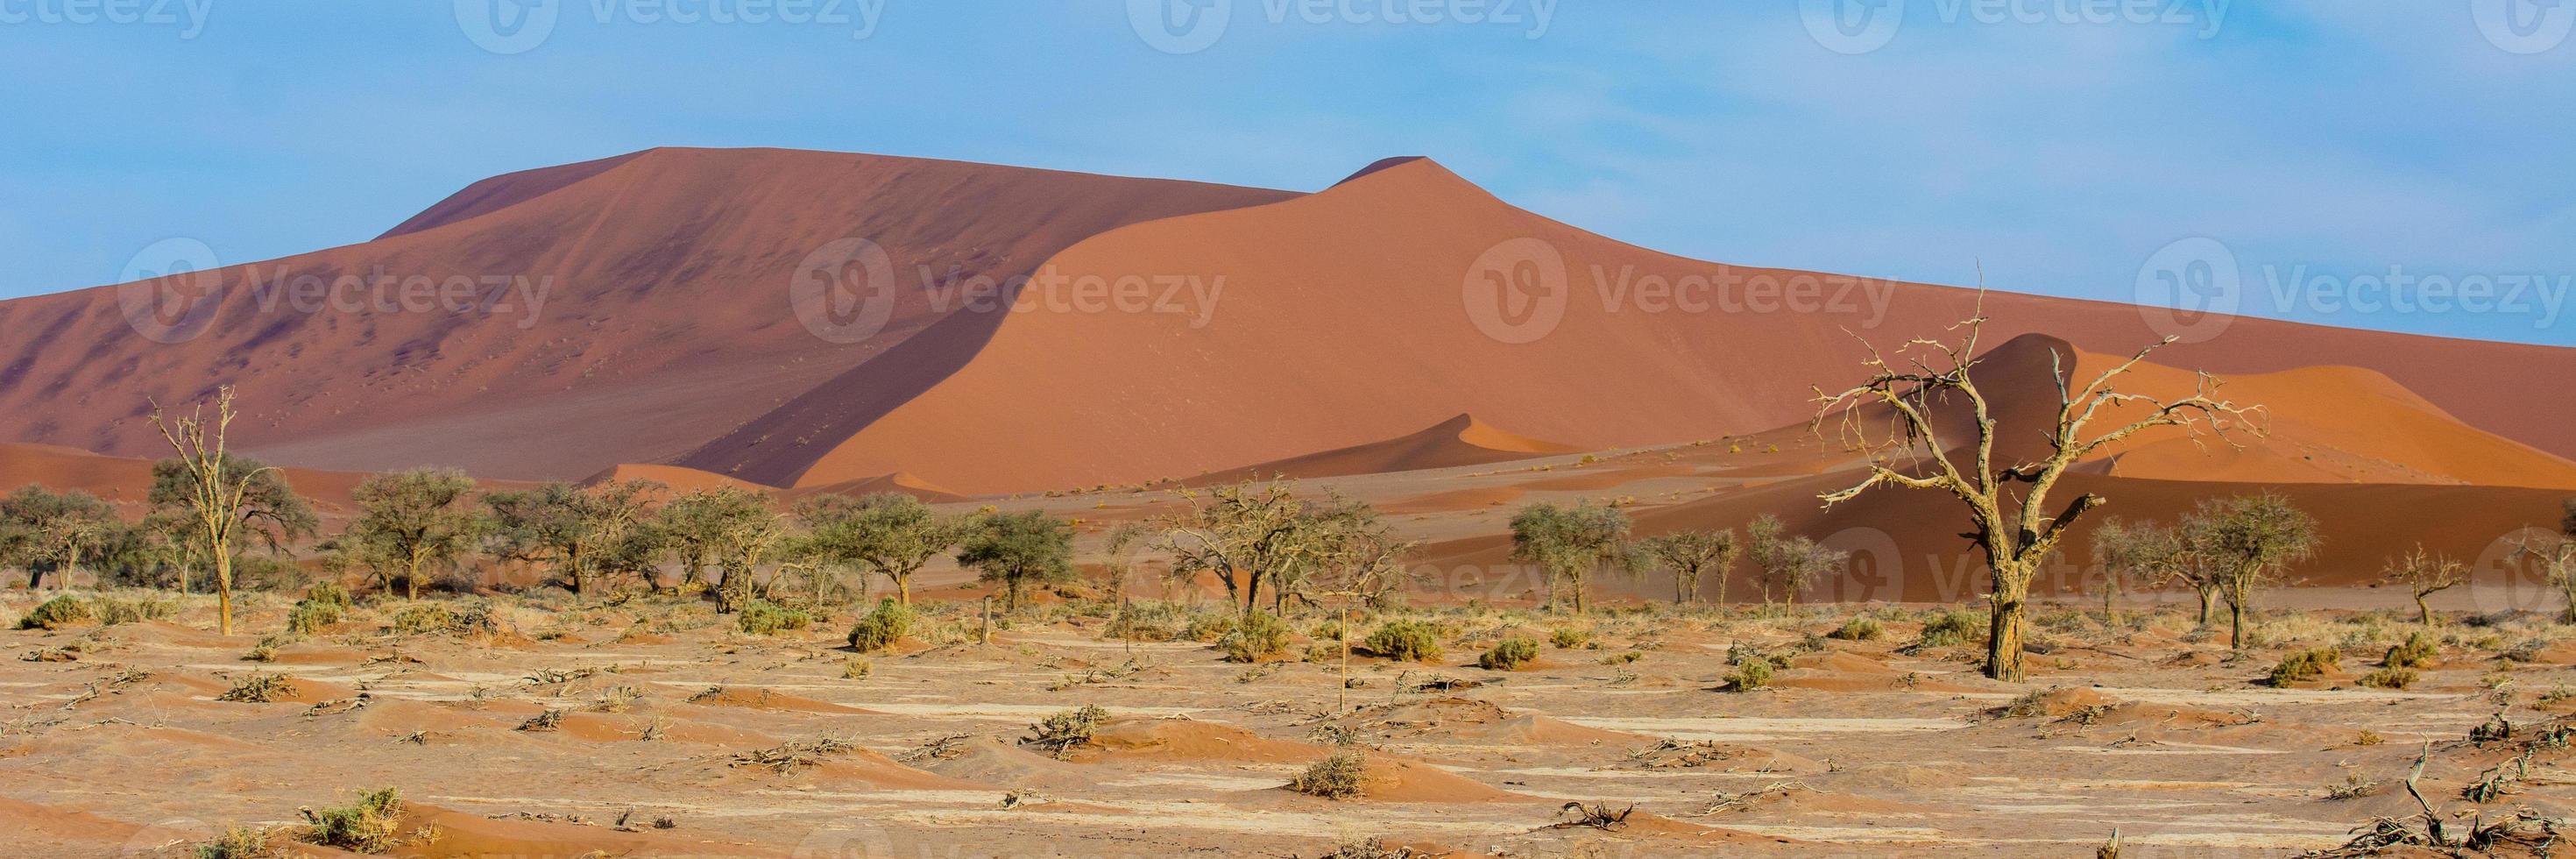 Red desert dunes photo